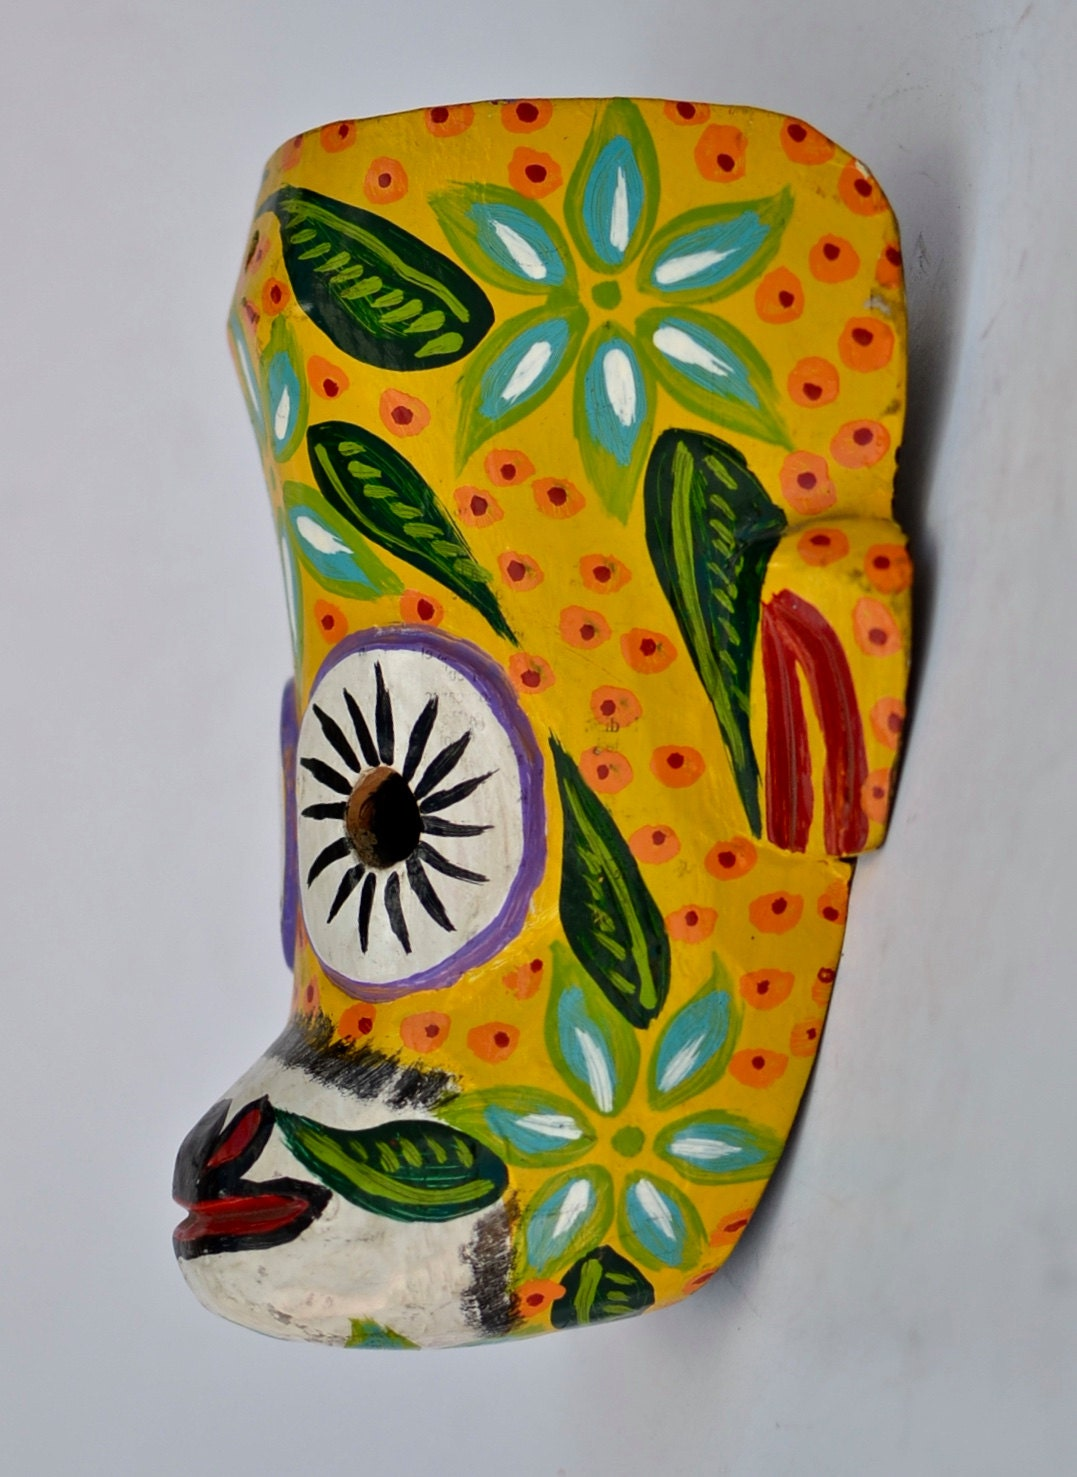 MSK27 - Nursery Decor - Yellow Monkey Mask - Colorful Mask - Wood ...